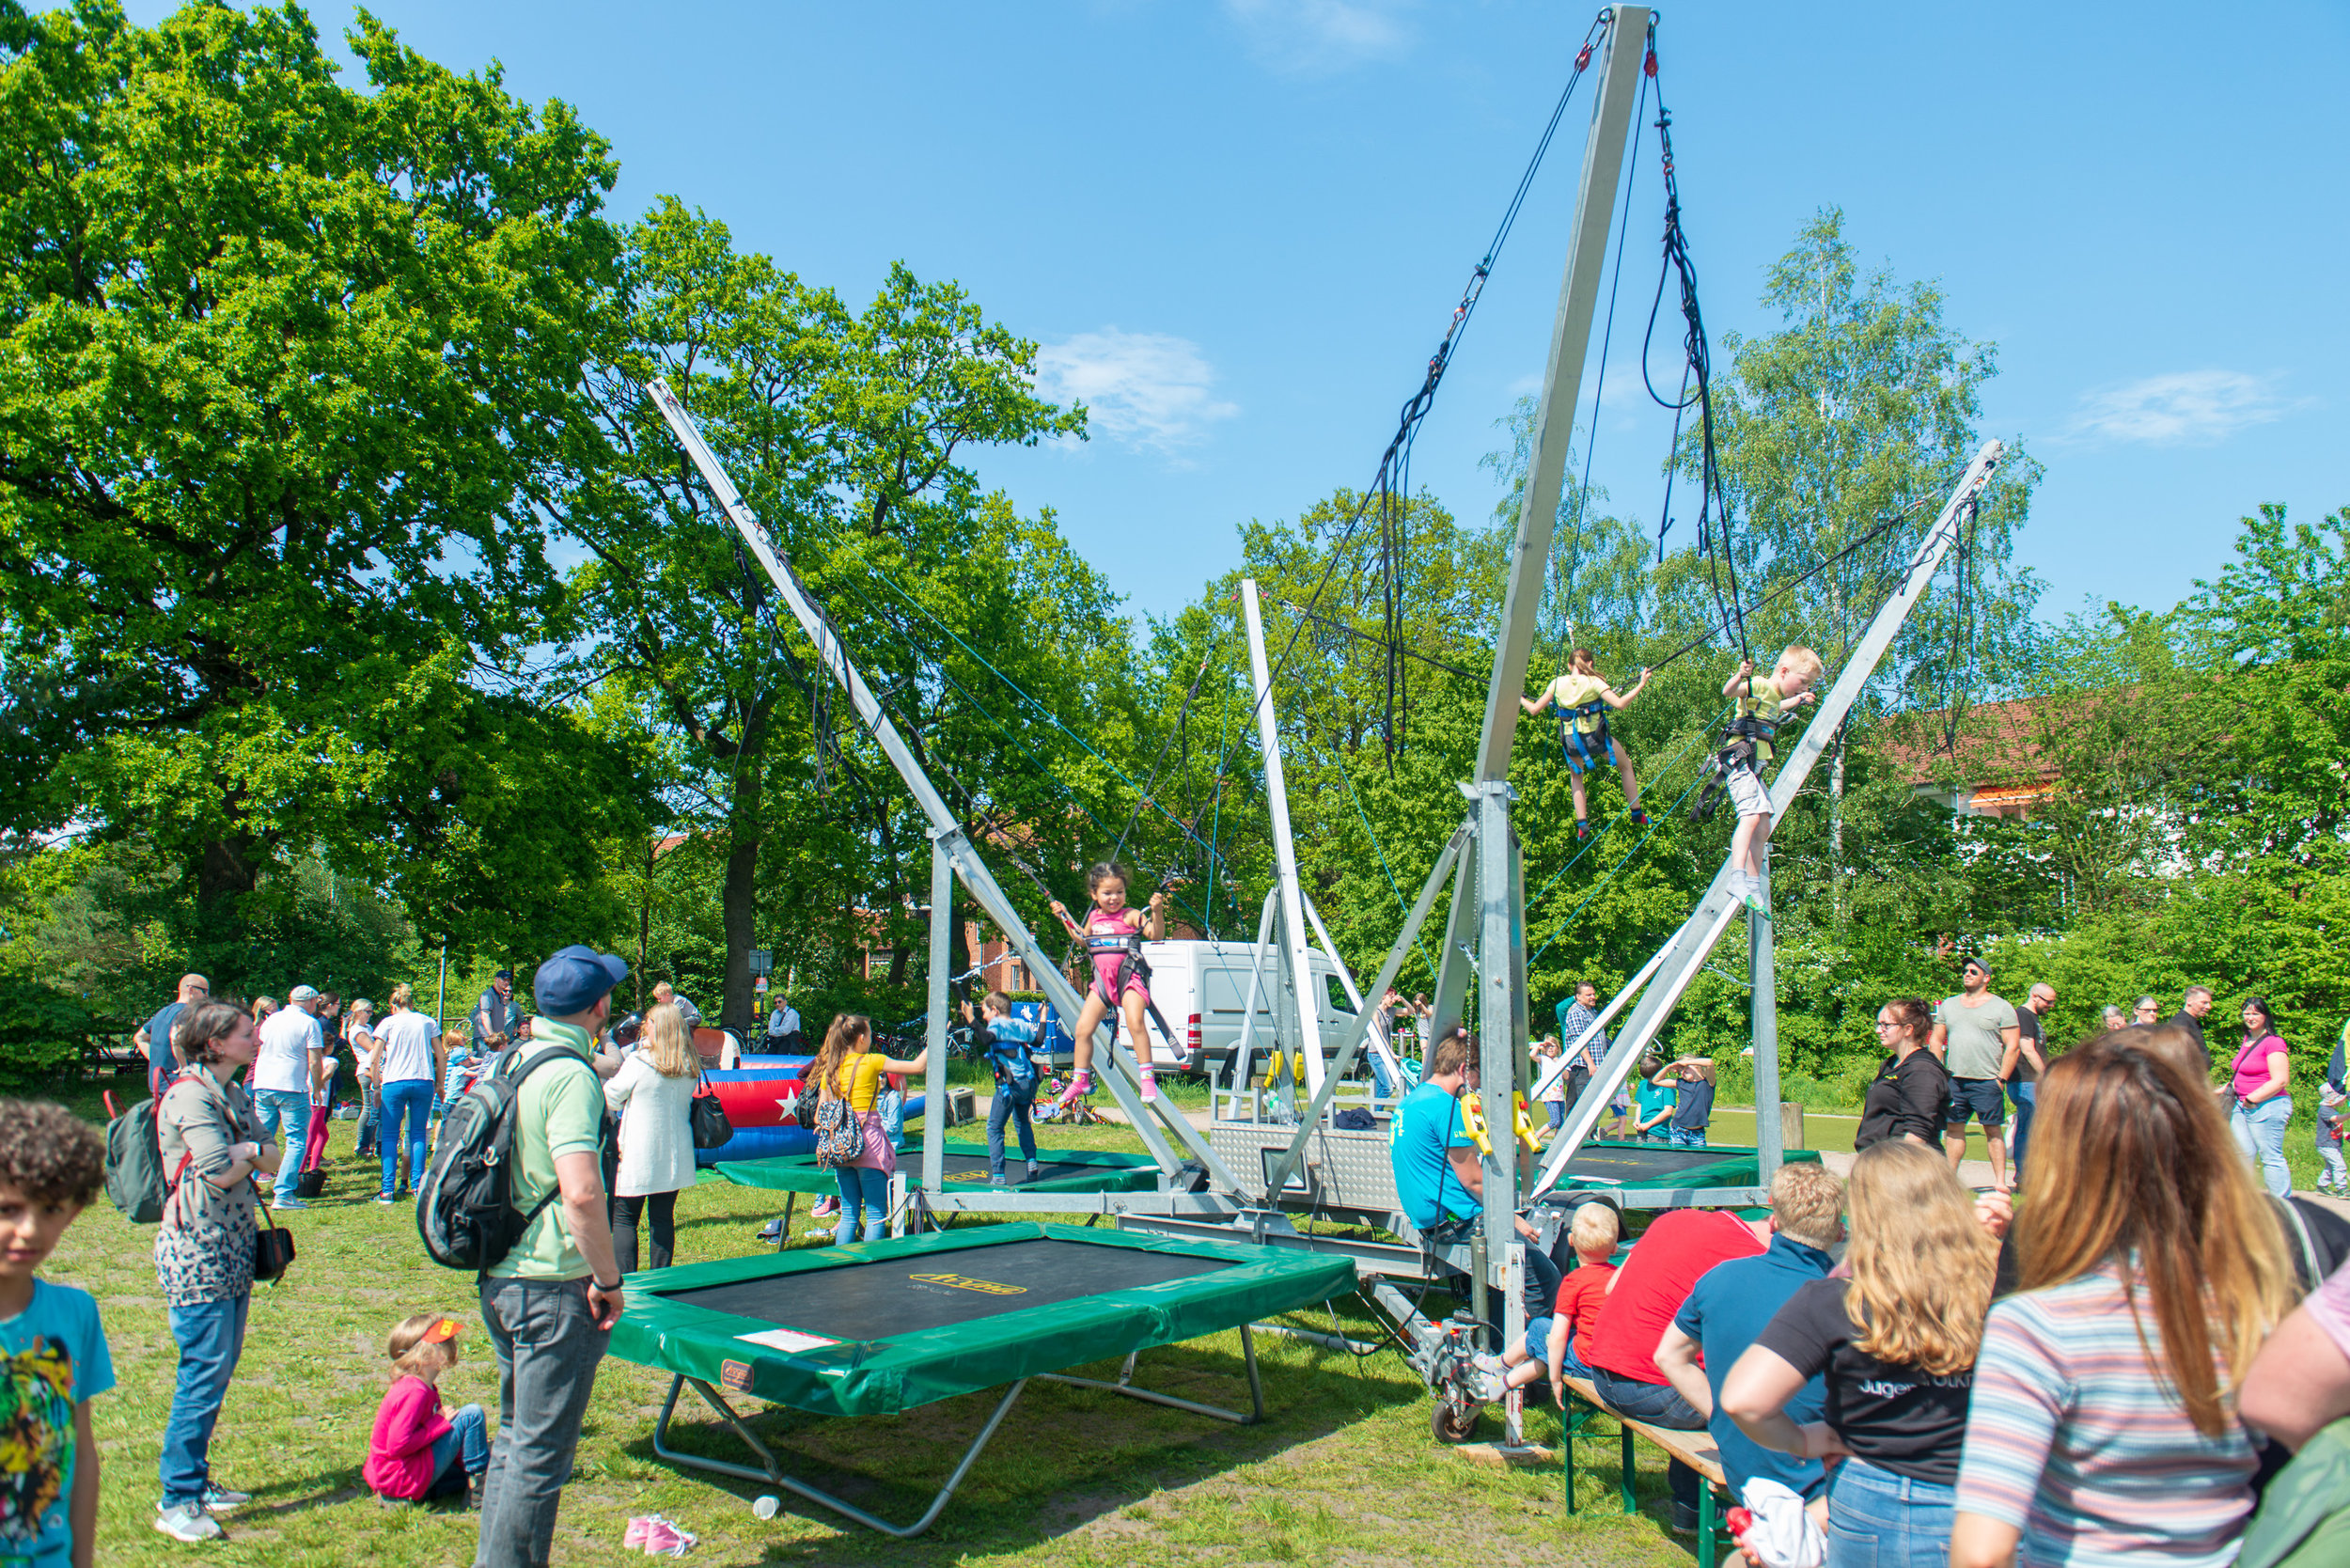 13-Norderstedter-Museumsfest-2019-FWM--XO-Dennys-Mamero-WEB-24.jpg